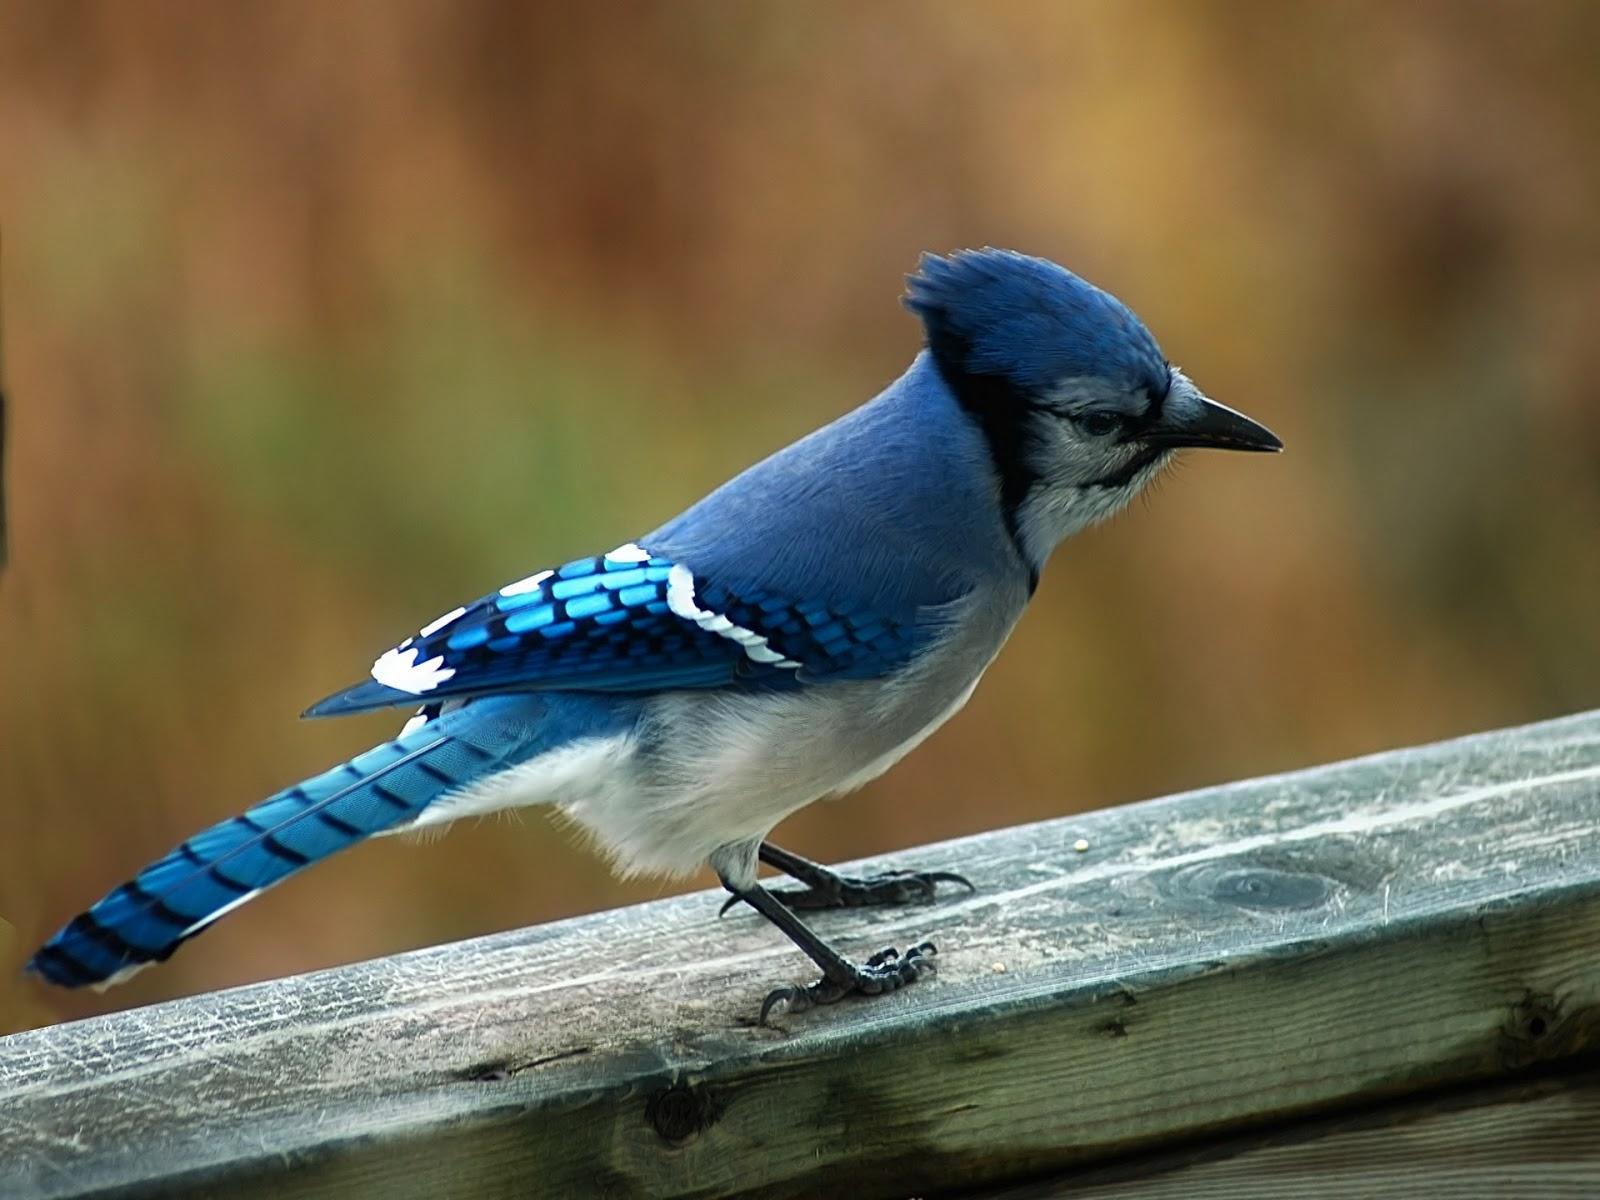 blue birds twins colorful birds colorful bird wallpaper small bird 1600x1200